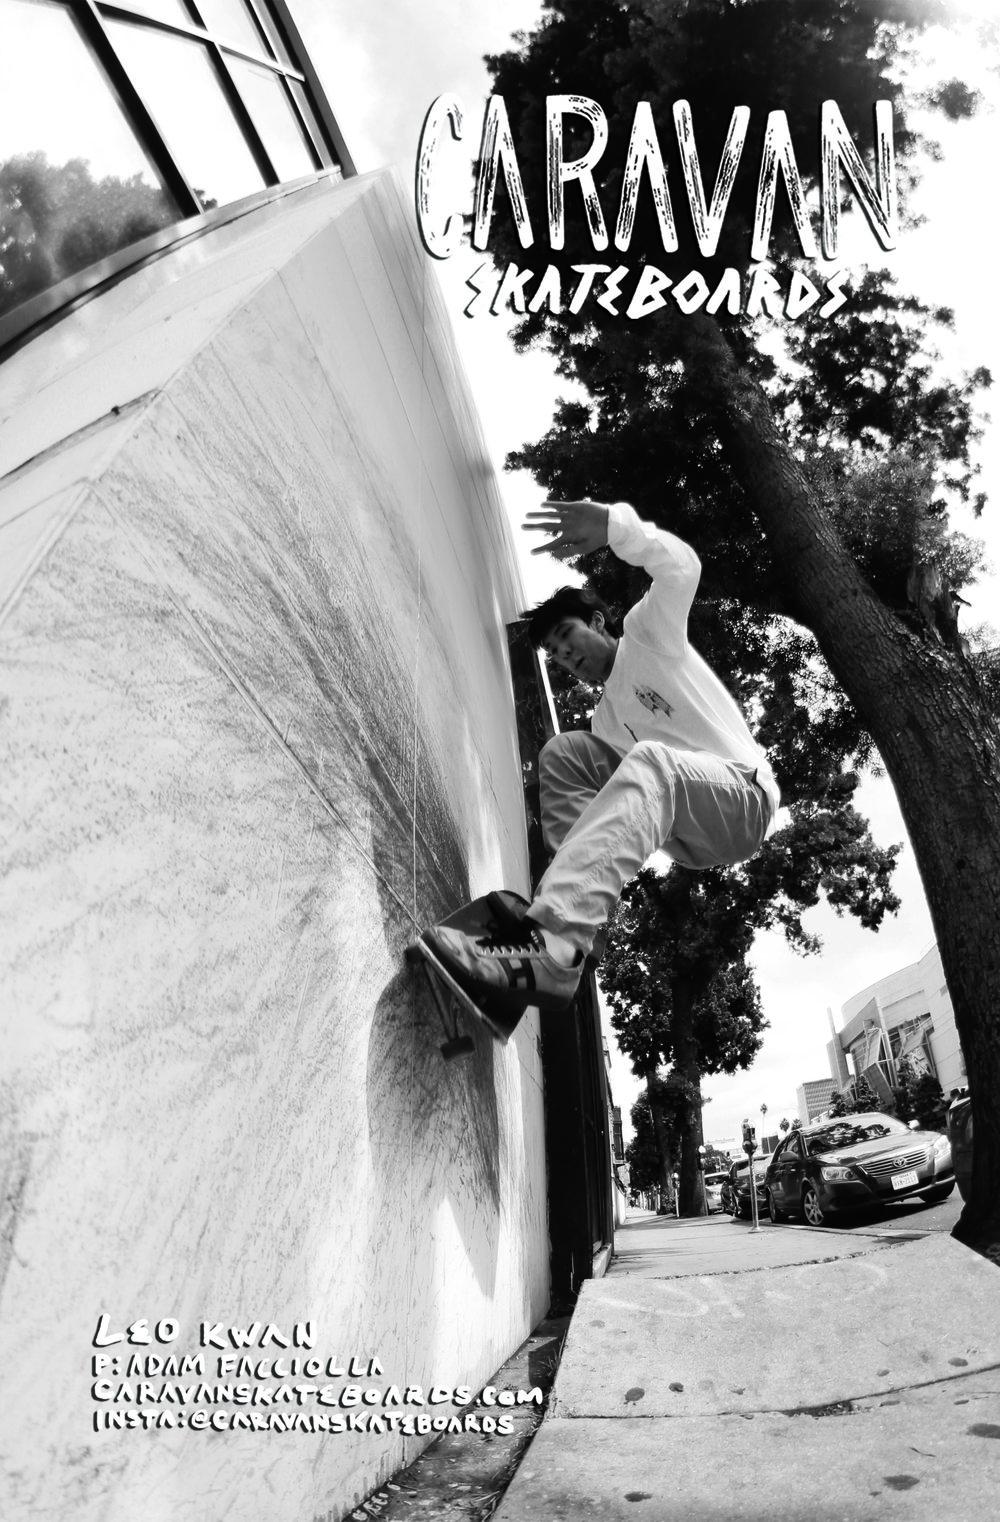 SkateJawnMar18_Caravan_LeoWallride.jpg